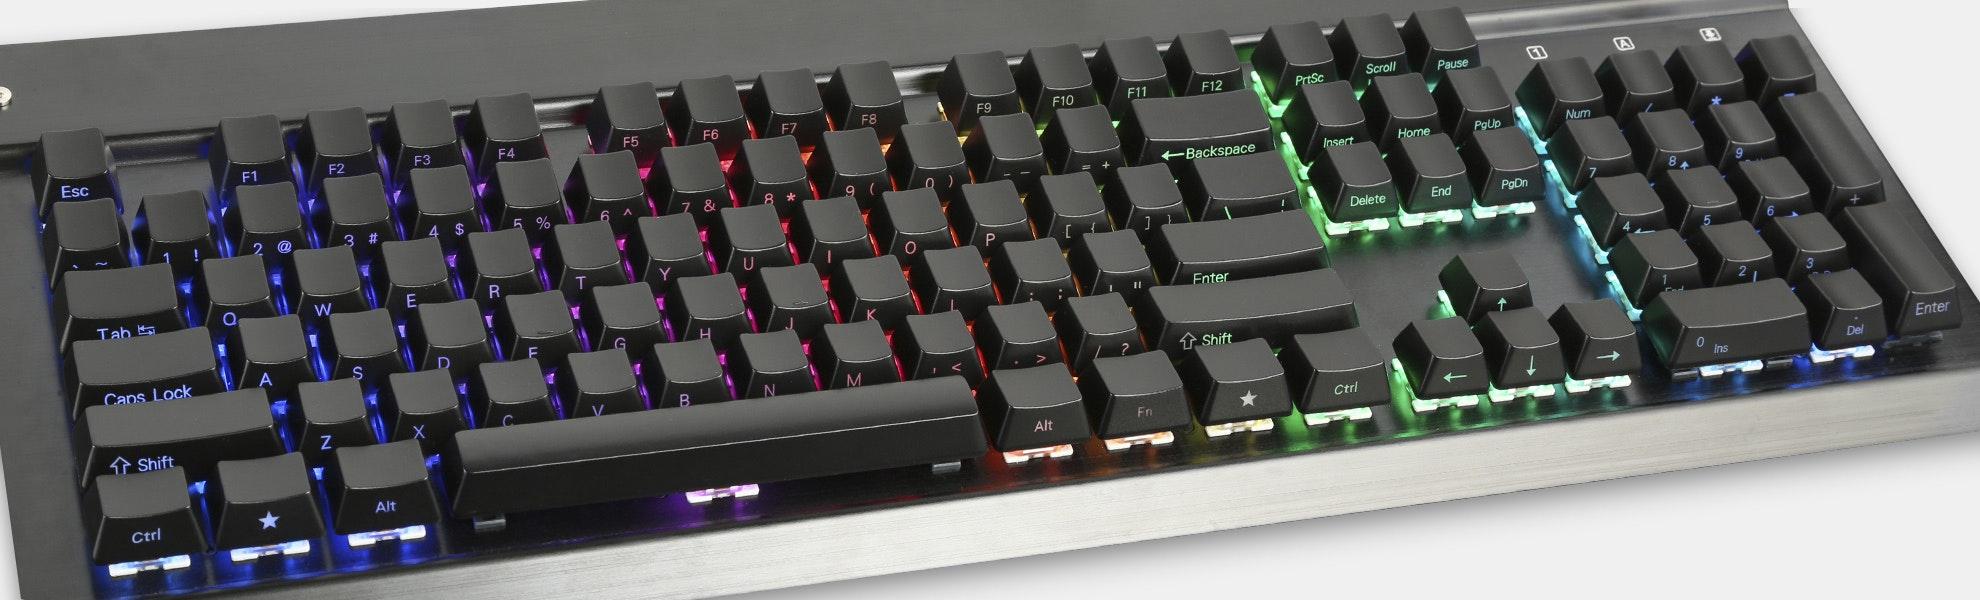 Side-Lit ABS Keycap Set